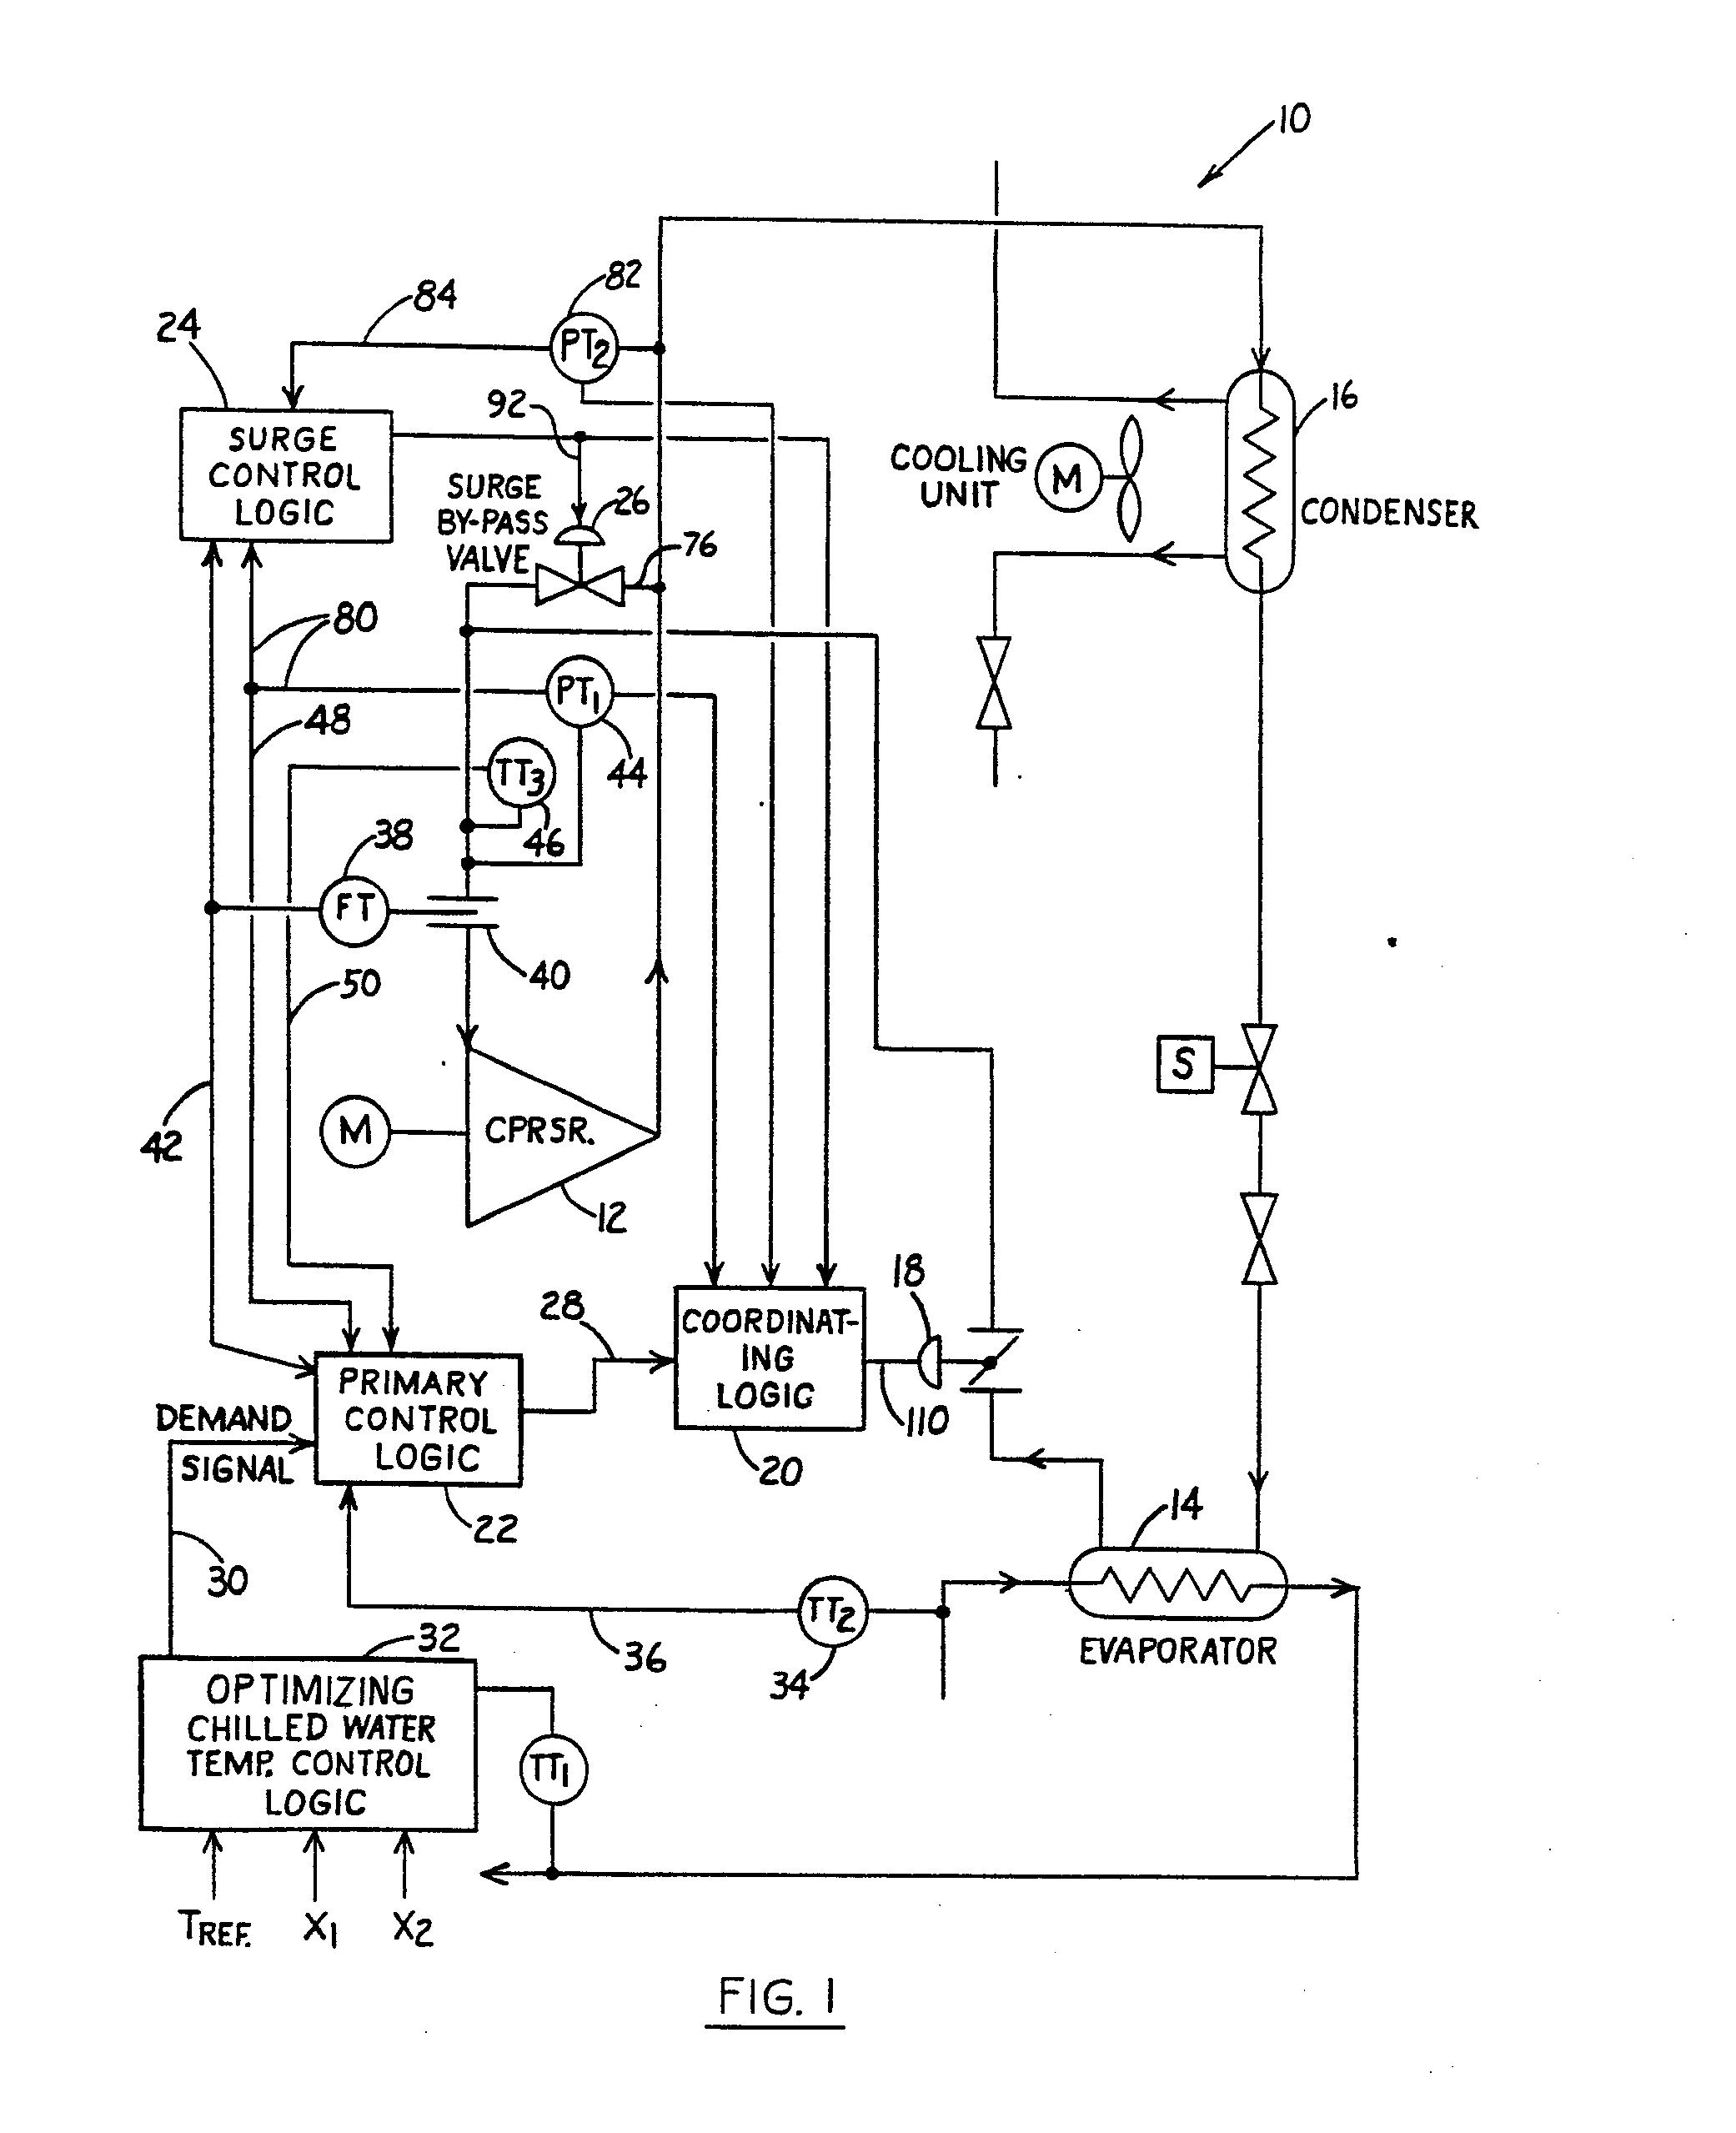 Logic Diagram Sama Wiring Diagrams Control Symbols Steam Turbine Loop Safety Switch